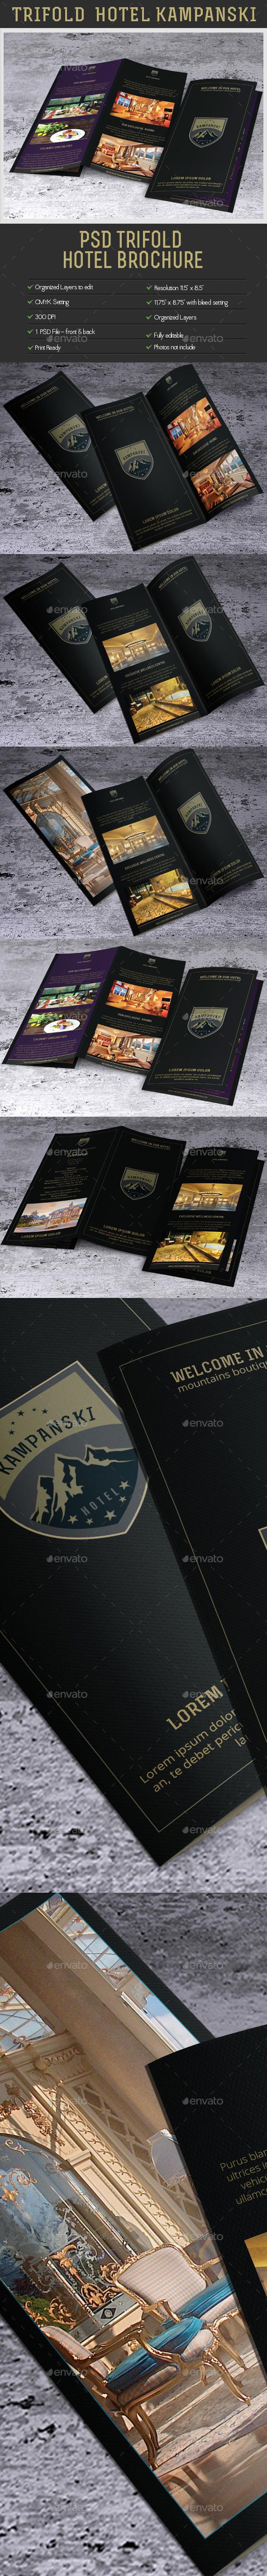 Creative TriFold Brochure Hotel Kampanski. - Brochures Print Templates